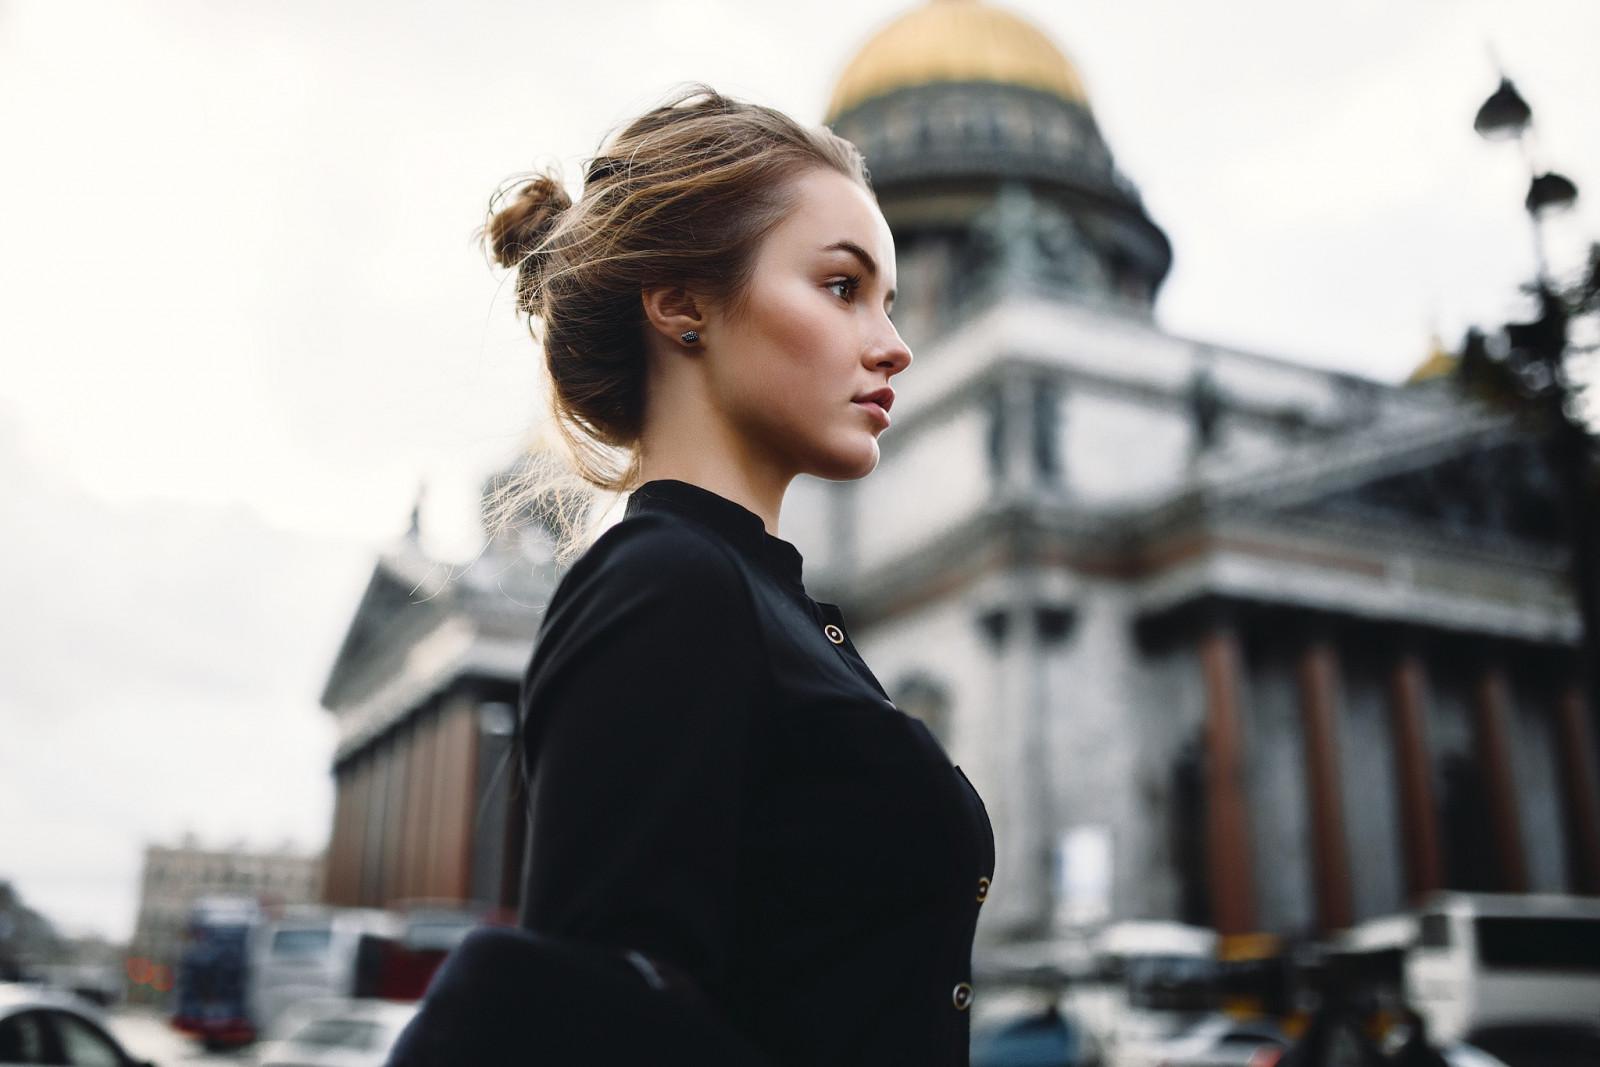 красавицы петербурга фото - 12